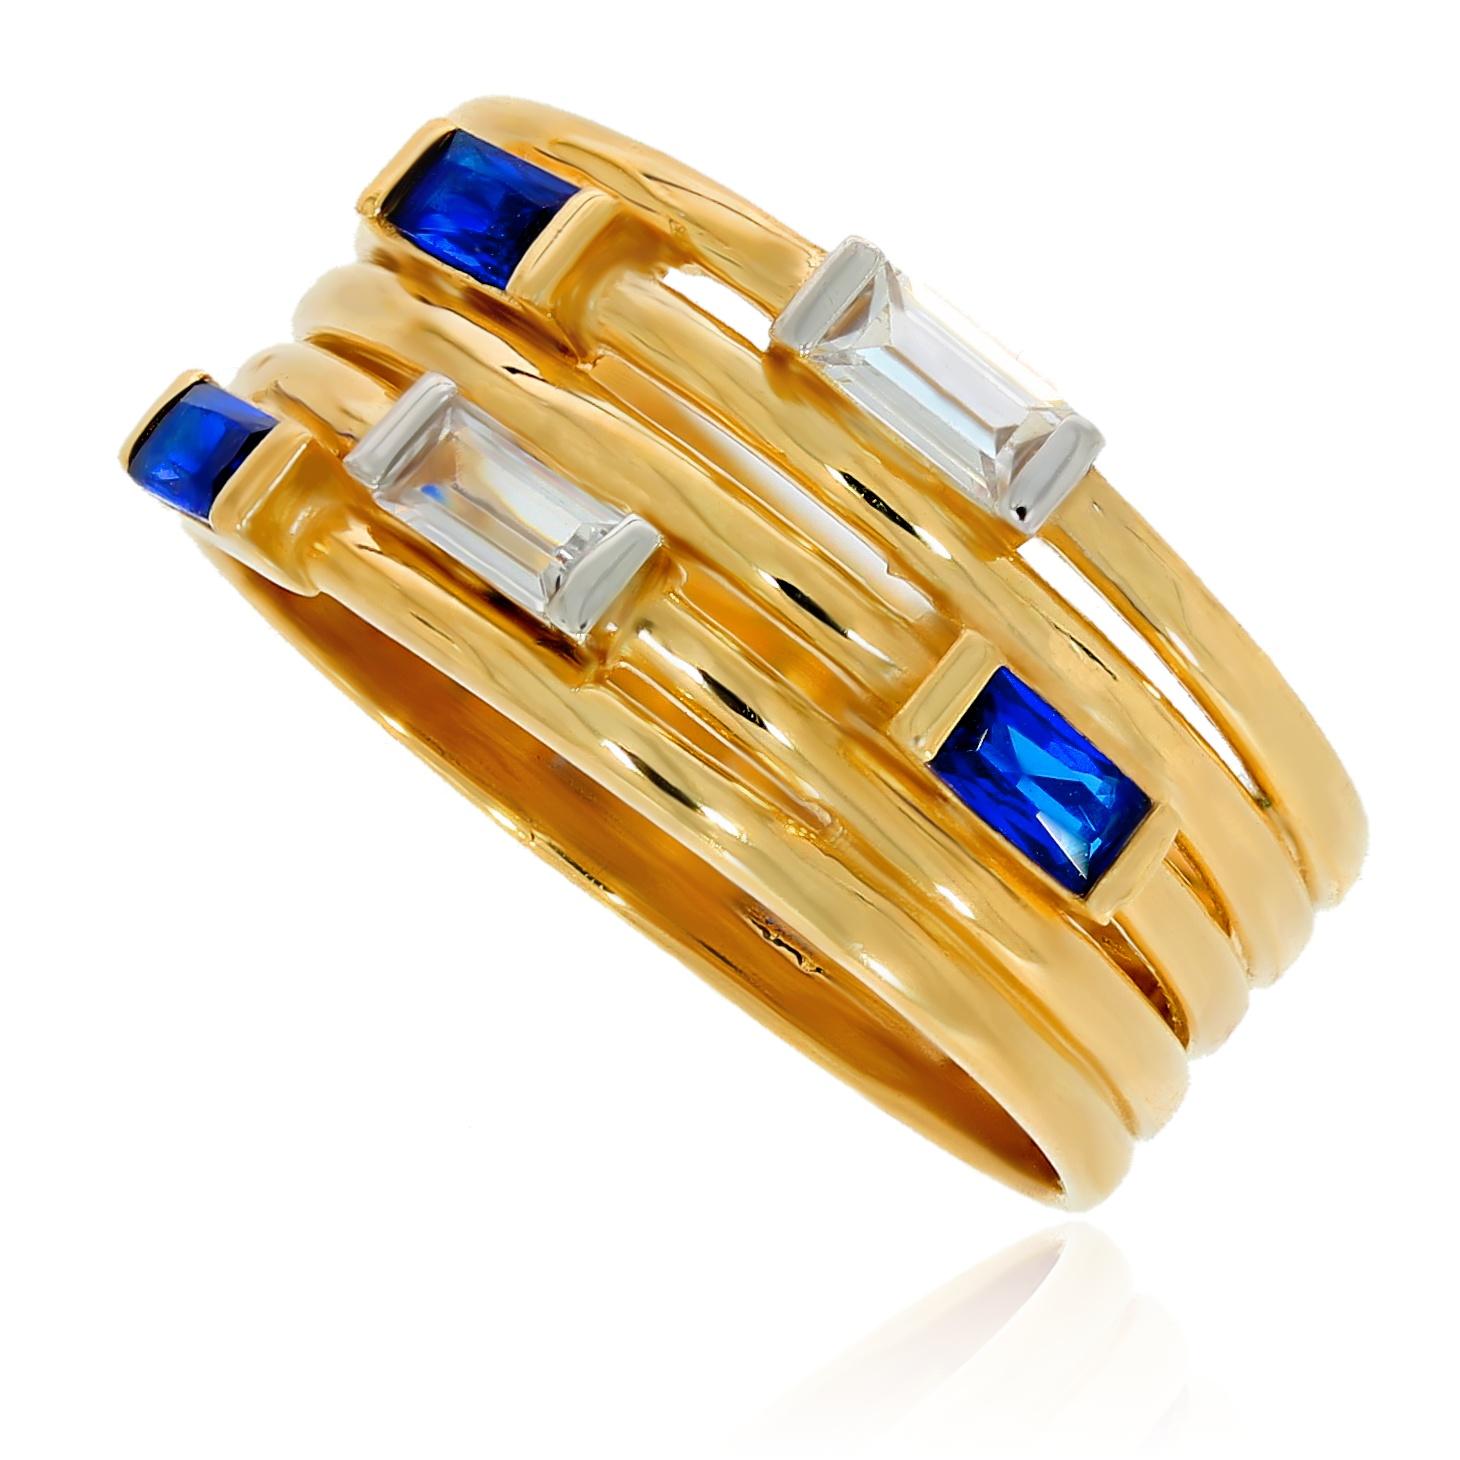 64376b3542abc5 Szeroki pierścionek szafir cyrkonia | Leo Diamonds - biżuteria ...